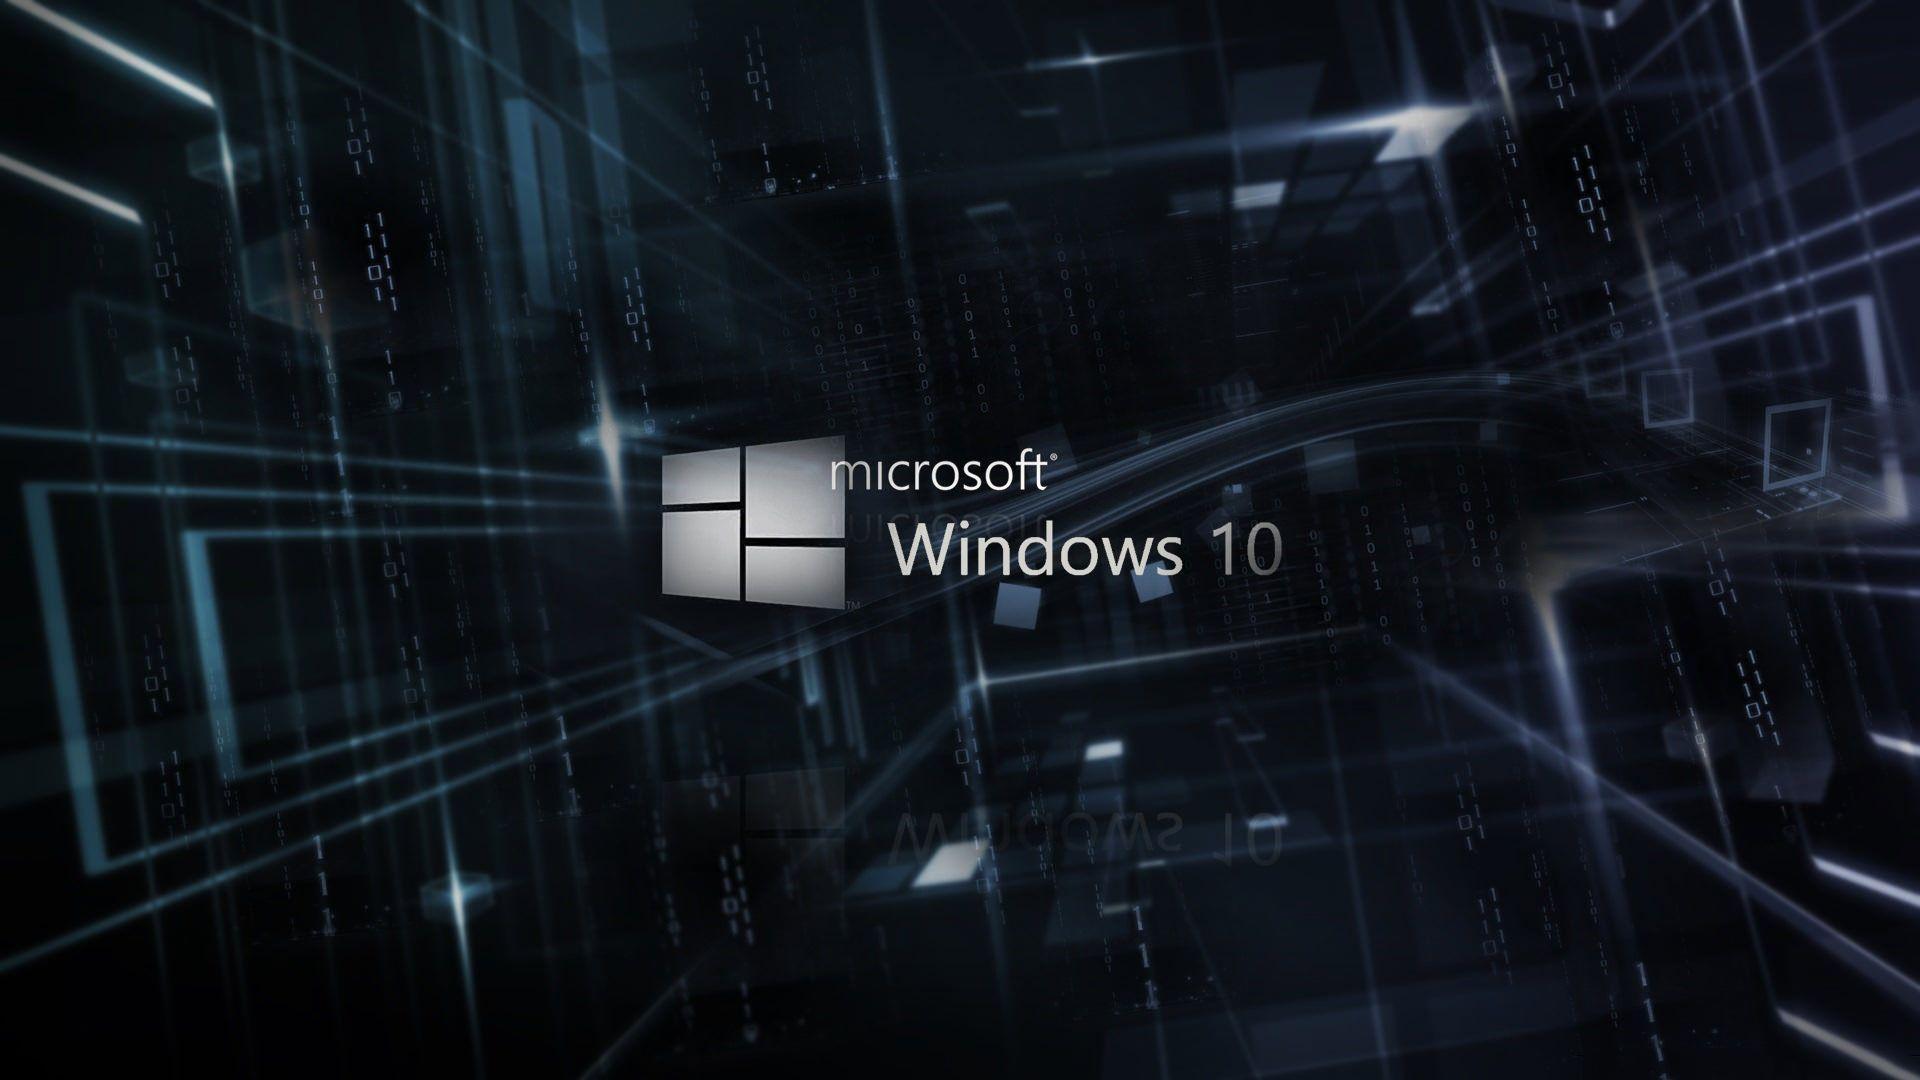 Microsoft 8K UHD Wallpapers - Top Free Microsoft 8K UHD ...